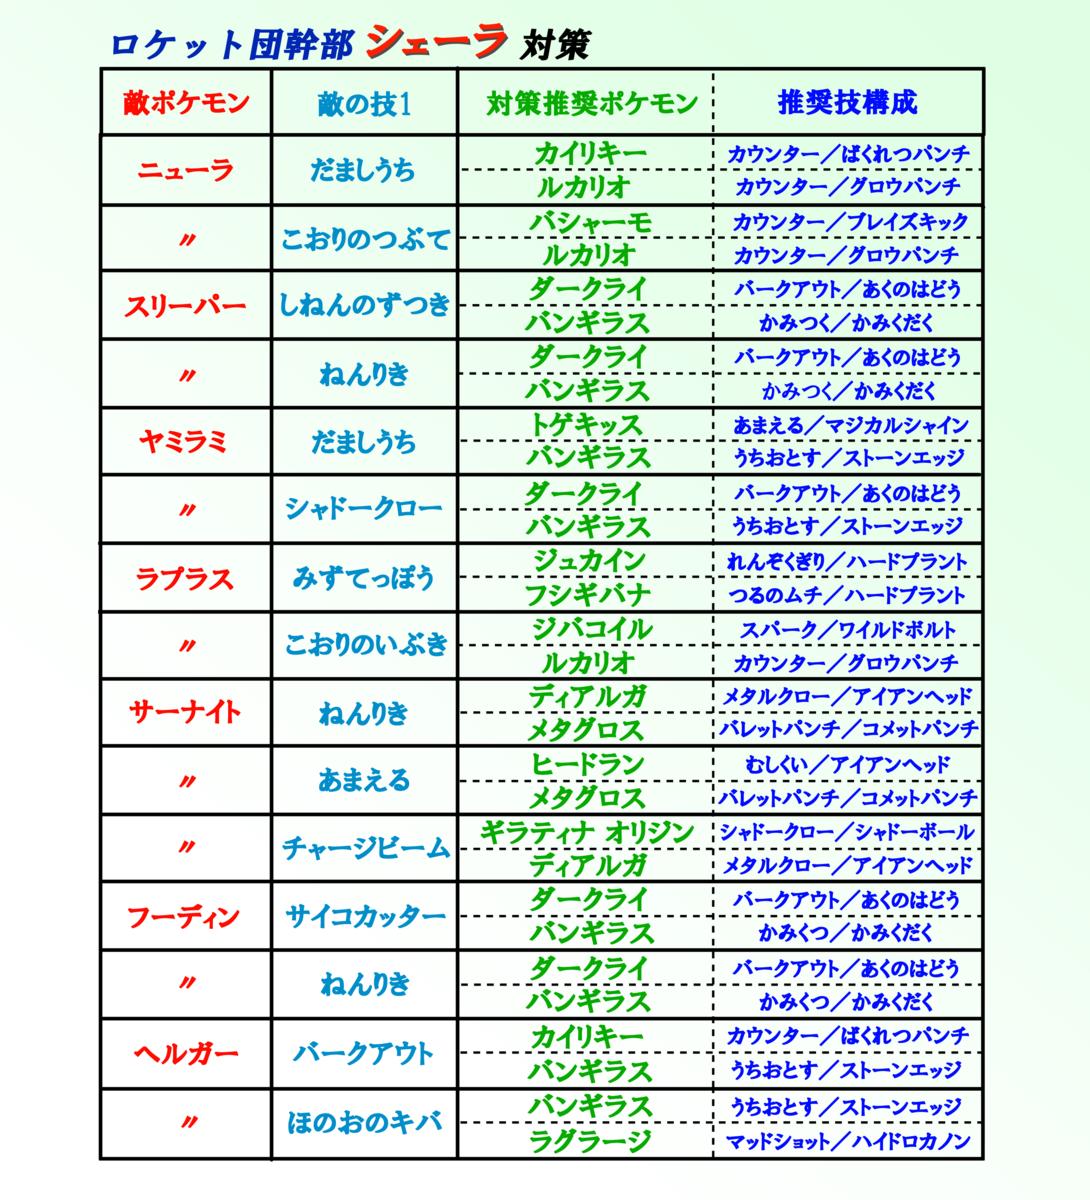 f:id:Kazumin0331:20191117035656p:plain